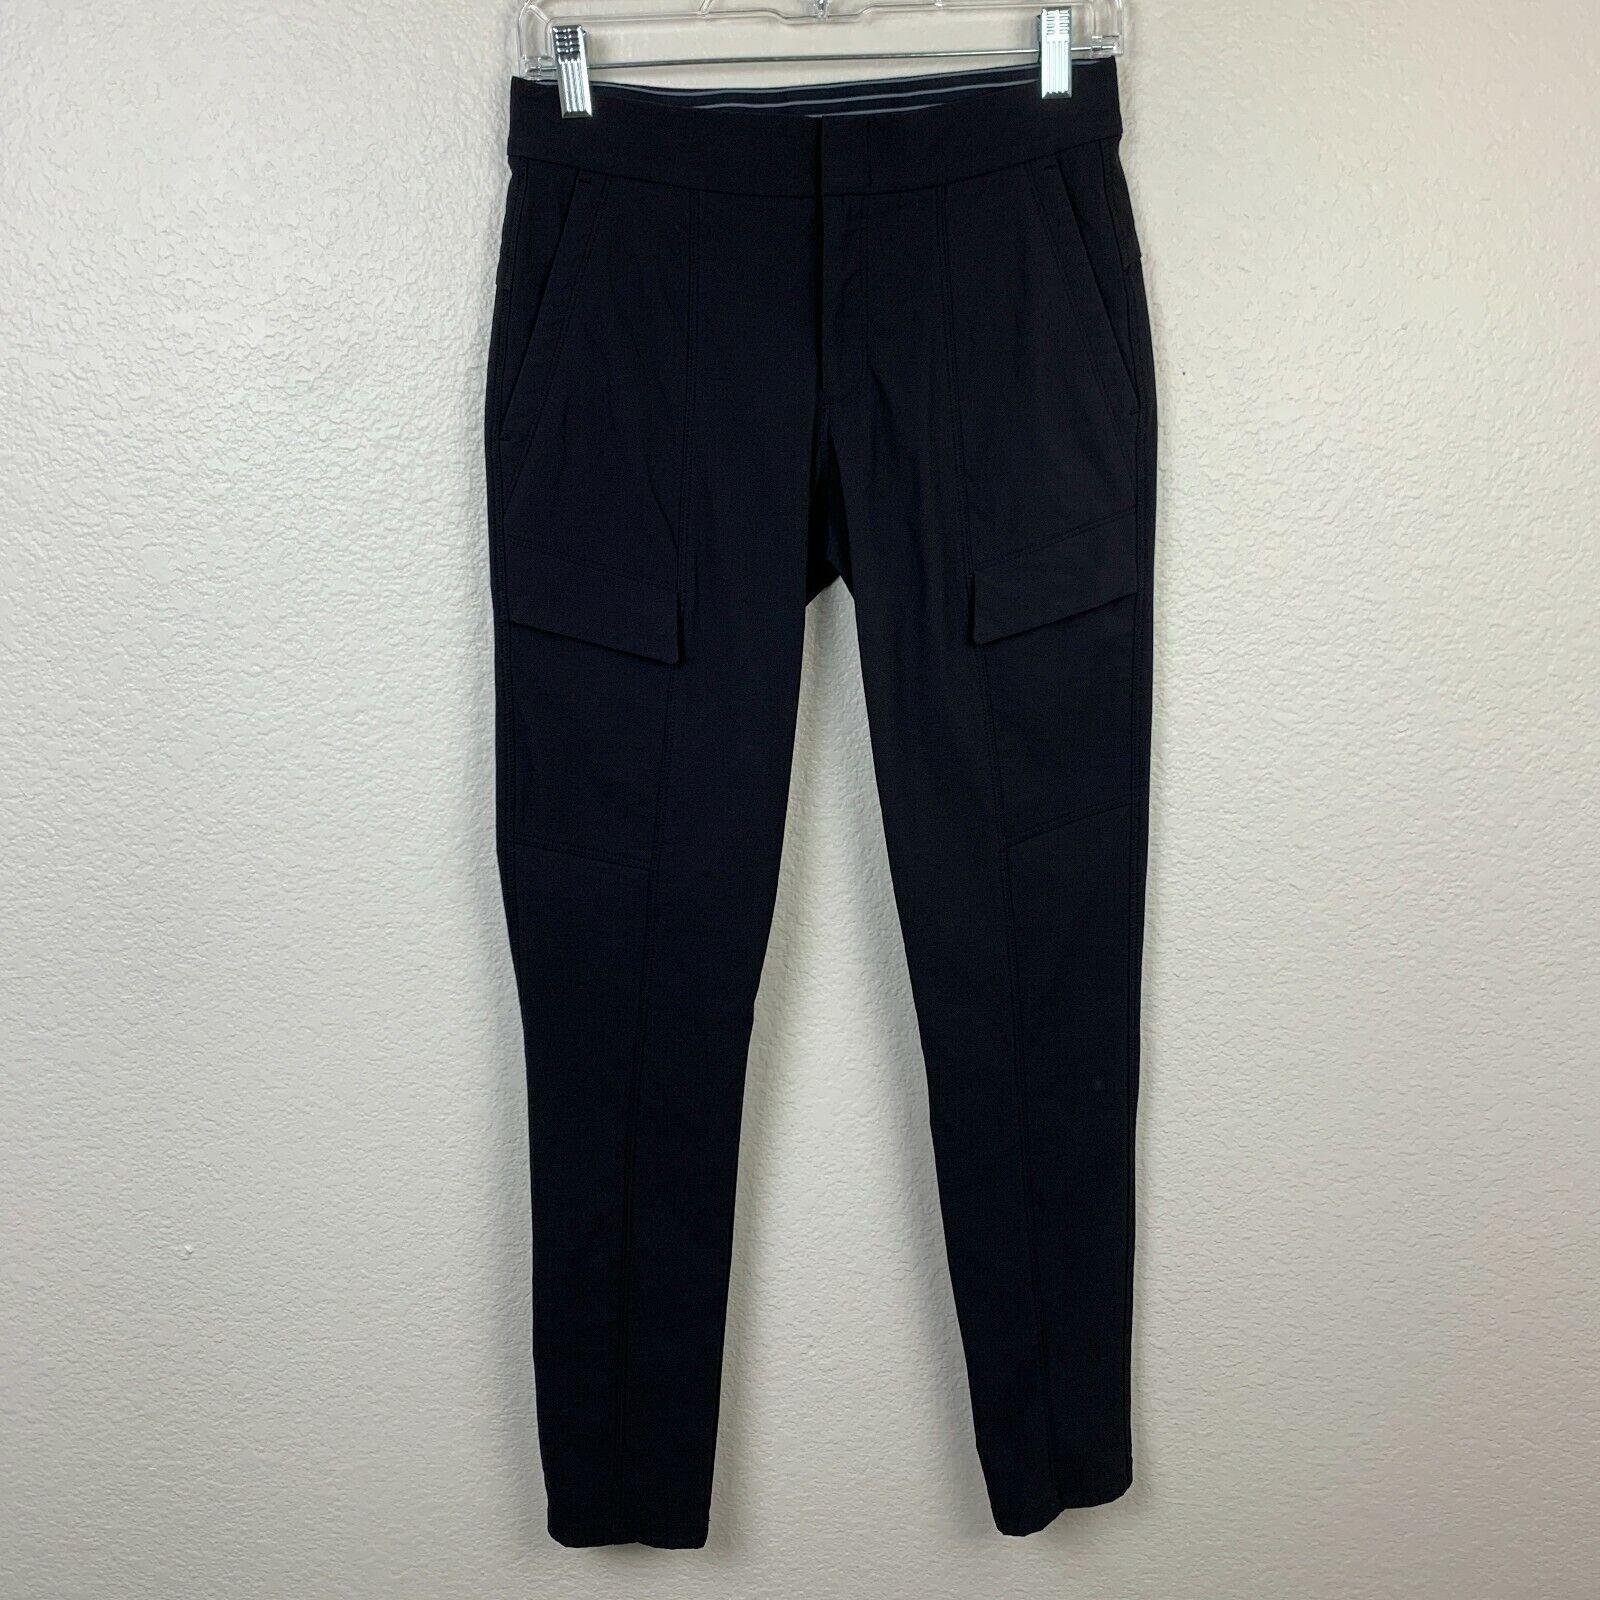 Athleta Wander Utility Pants Size 0 Black Style 870858 Zip Pockets Trail Office